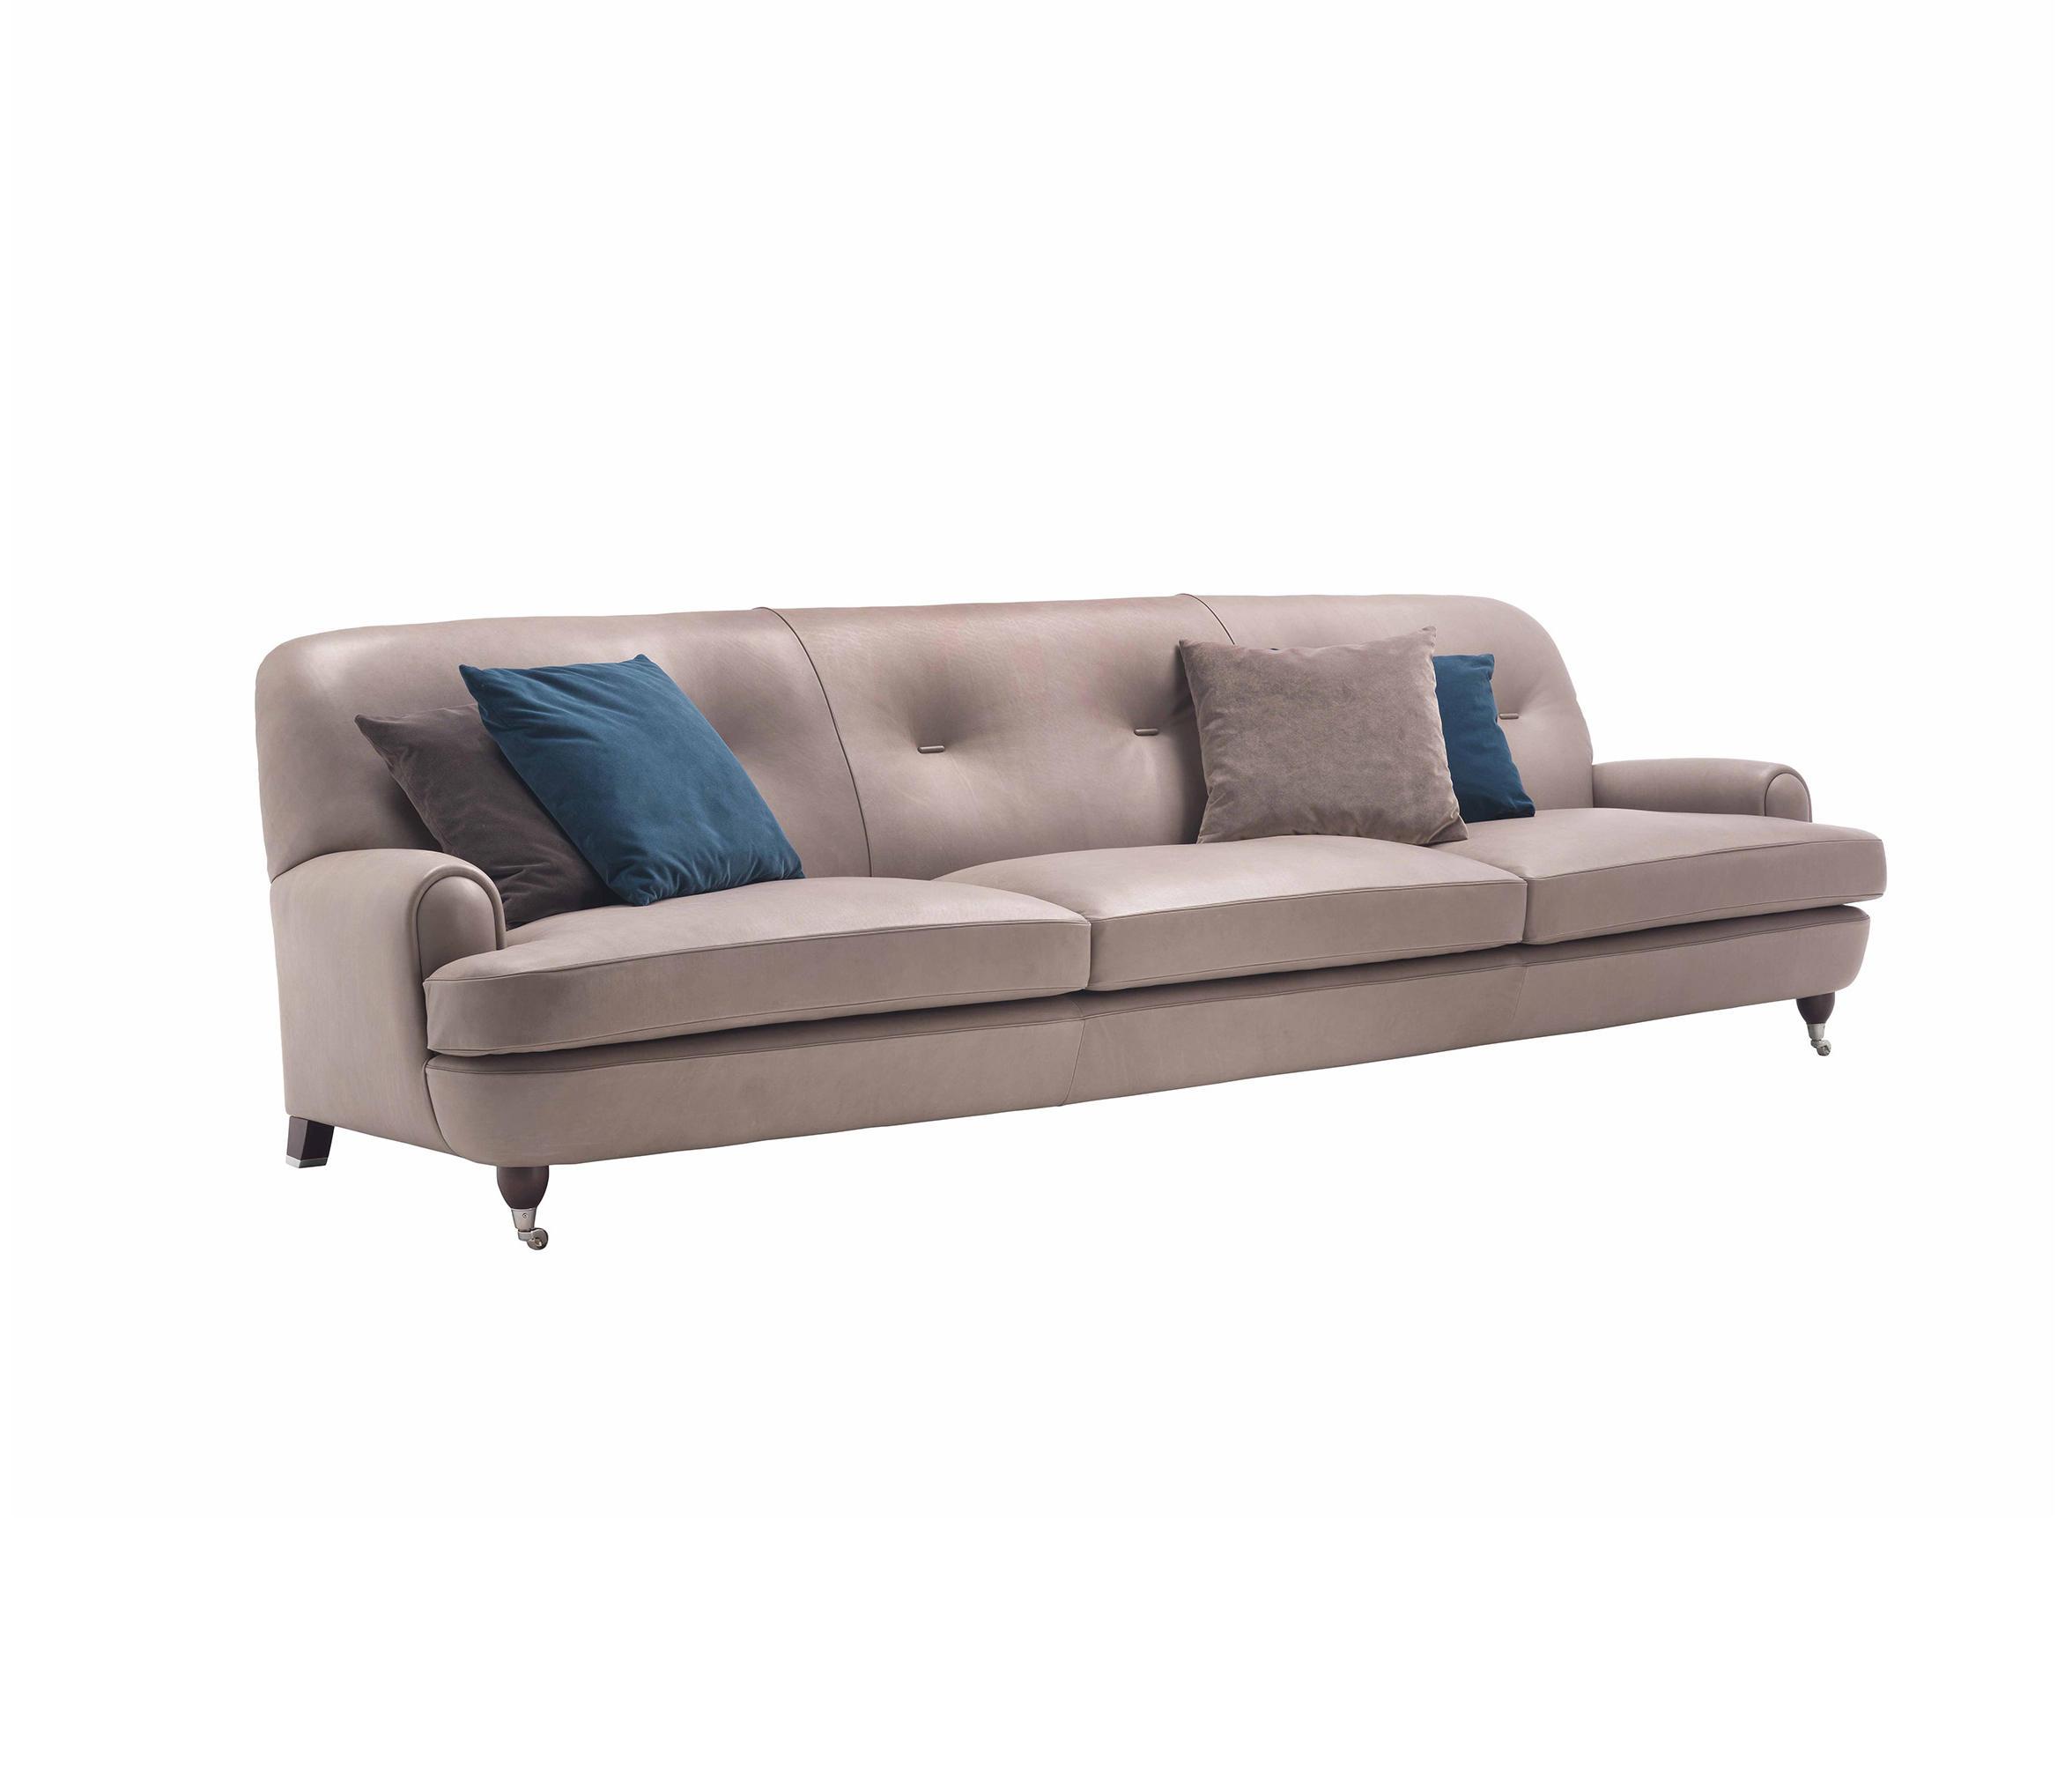 poltrona frau sofa kennedee leather shop near me sofas designer socrate black